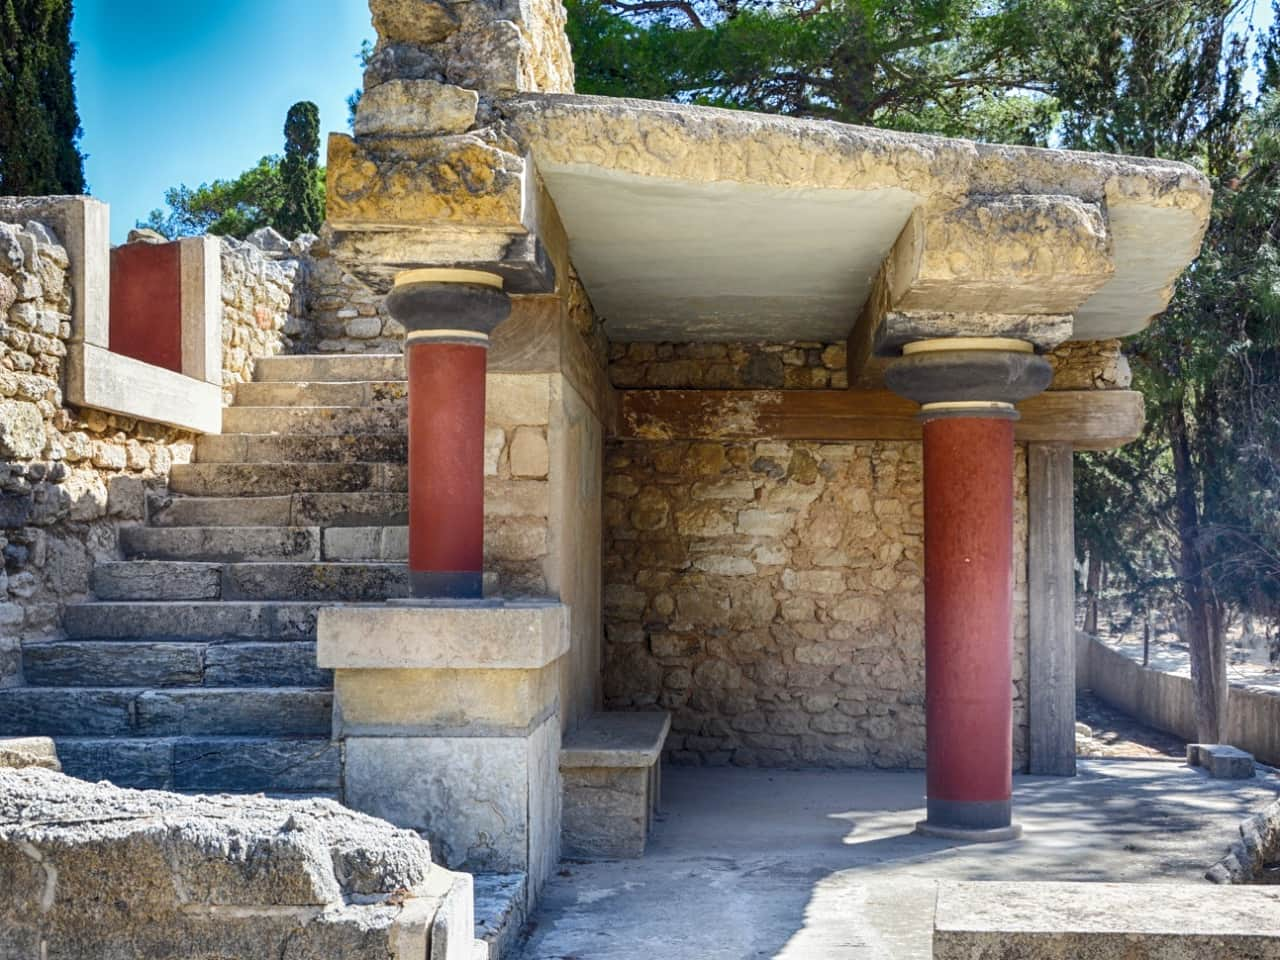 Minoan Palace Of Knossos & Archaeological Museum of Heraklion Private Tour, knossos museum iraklion tour, Archaeological Museum of Heraklion Private Tour, minoan palace of knossos best tour crete, heraklion activities, best things to do heraklion